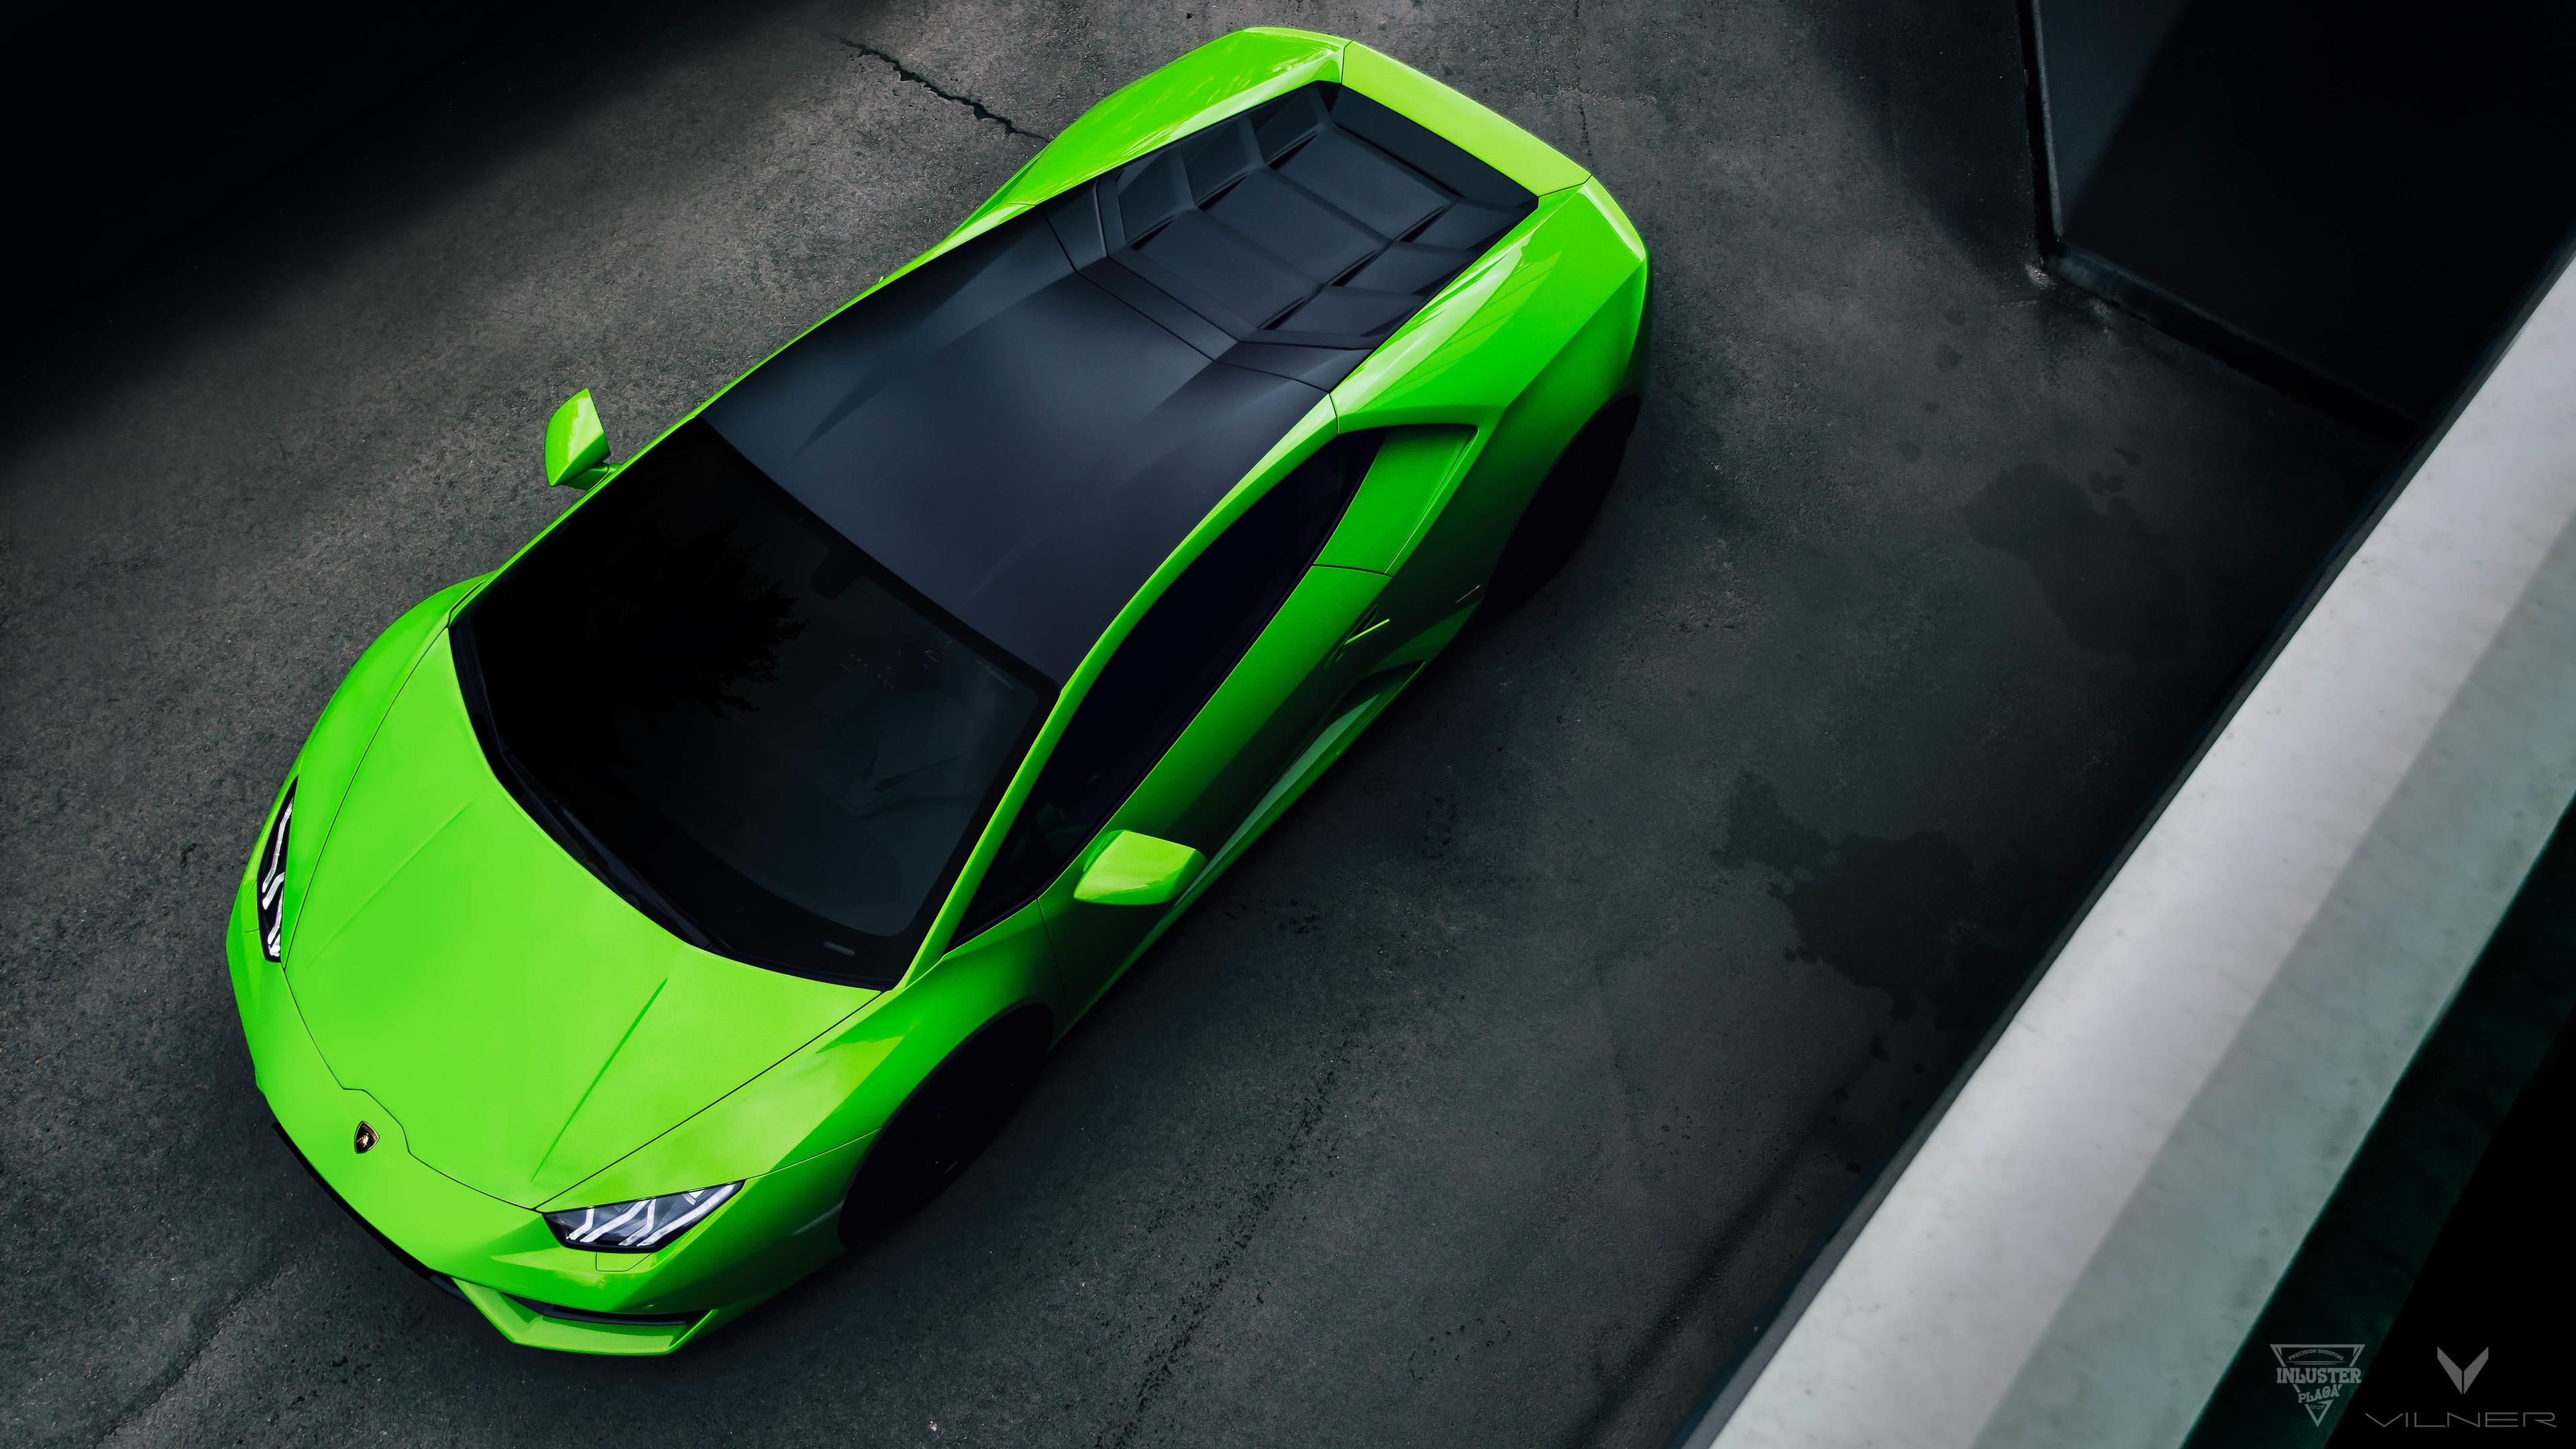 green lamborghini huracan upper view 4k 1541969147 - Green Lamborghini Huracan Upper View 4k - lamborghini wallpapers, lamborghini huracan wallpapers, hd-wallpapers, cars wallpapers, 4k-wallpapers, 2018 cars wallpapers